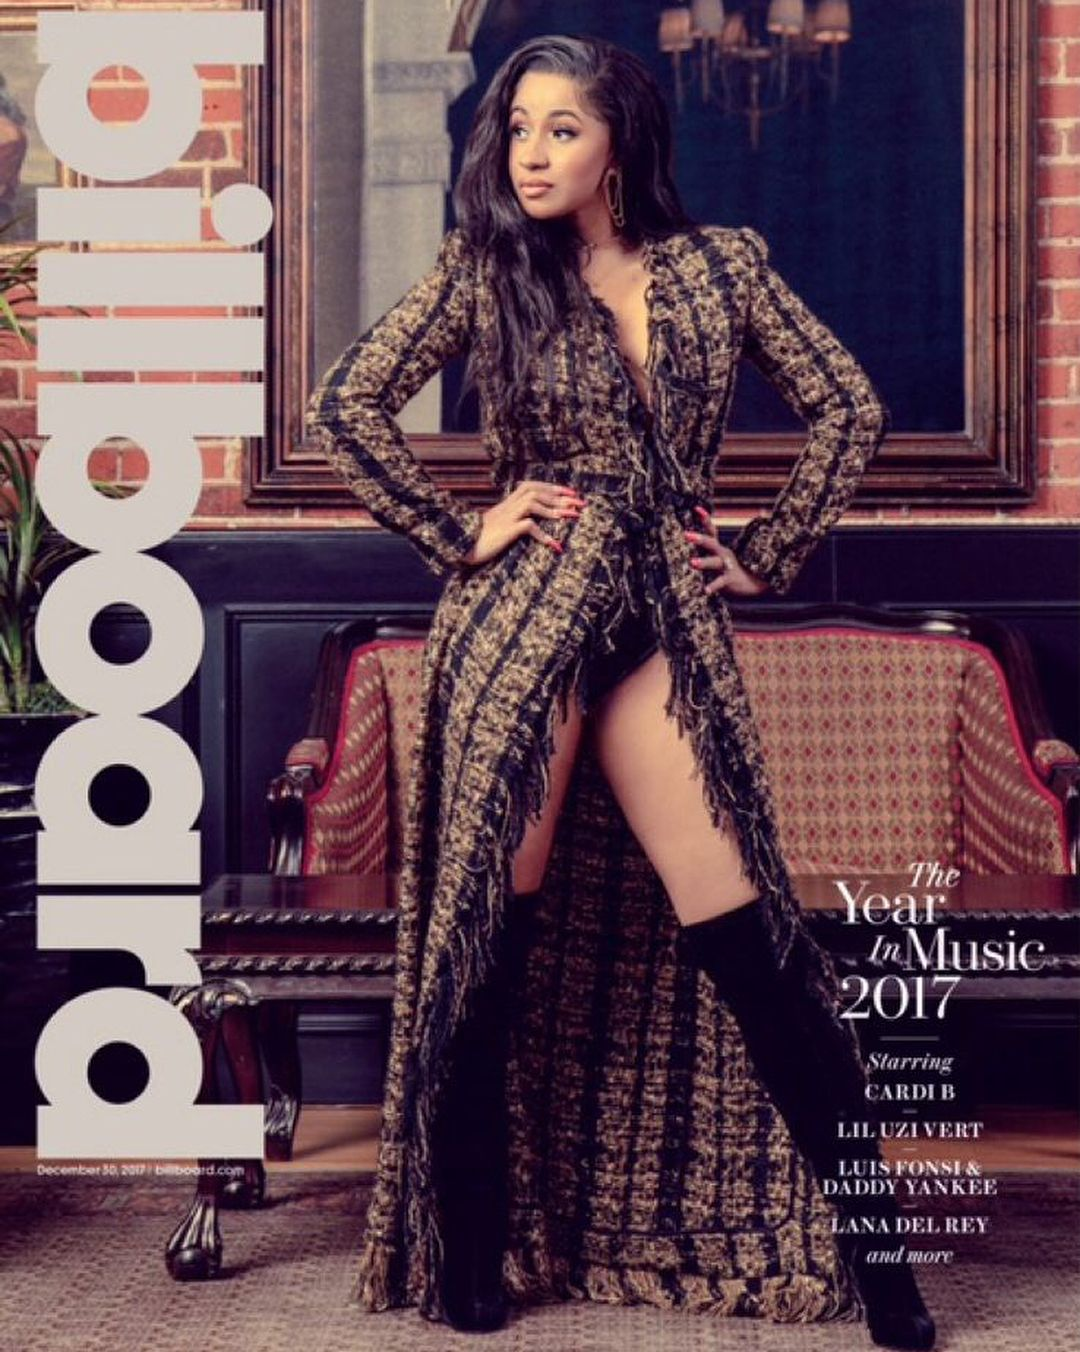 billboard magazine subscription - HD1080×1352